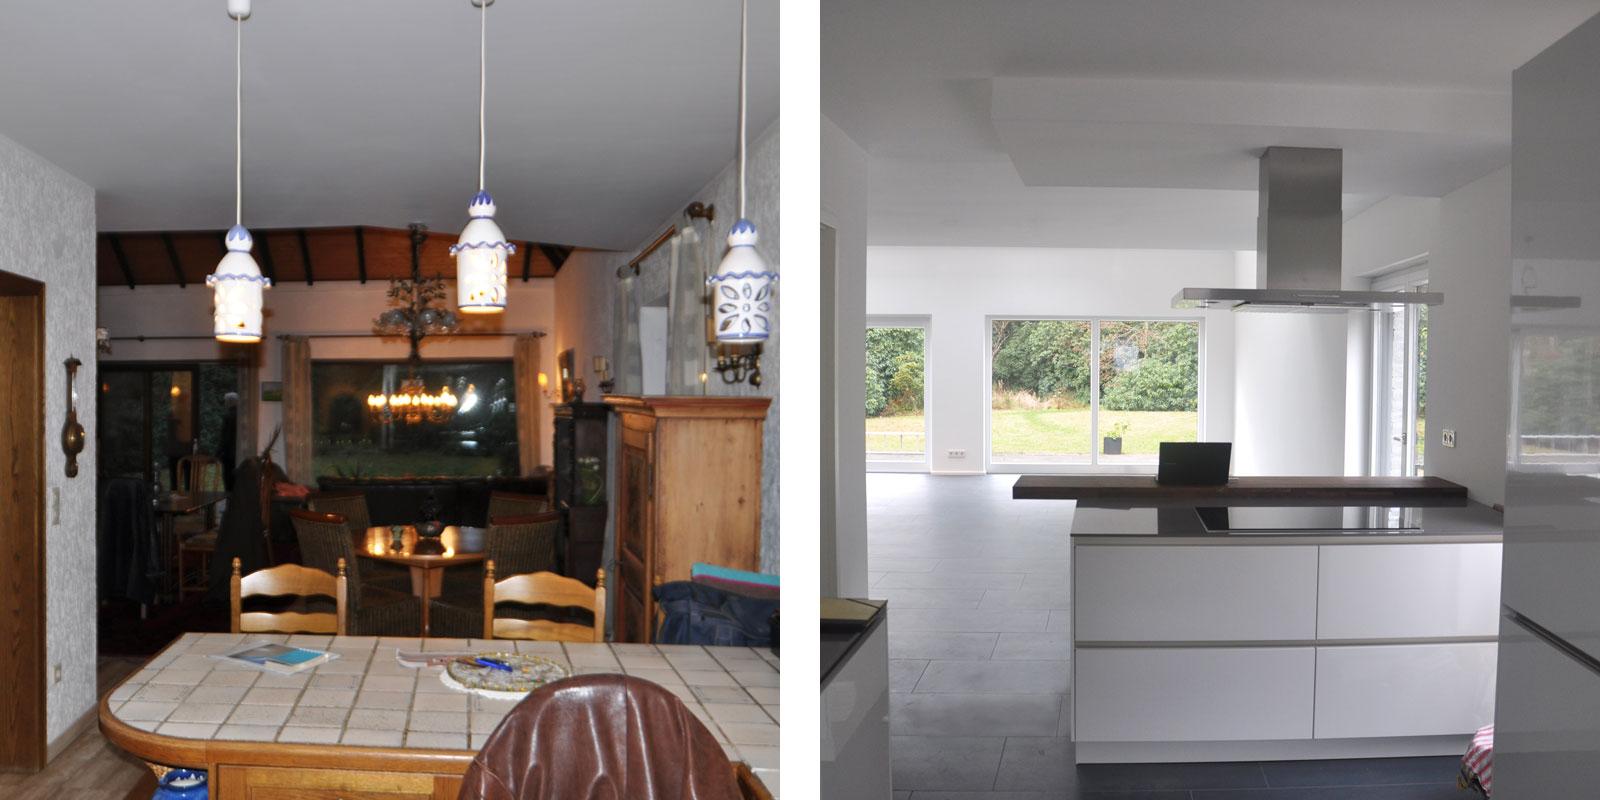 haus z2 henke siassi architekten. Black Bedroom Furniture Sets. Home Design Ideas